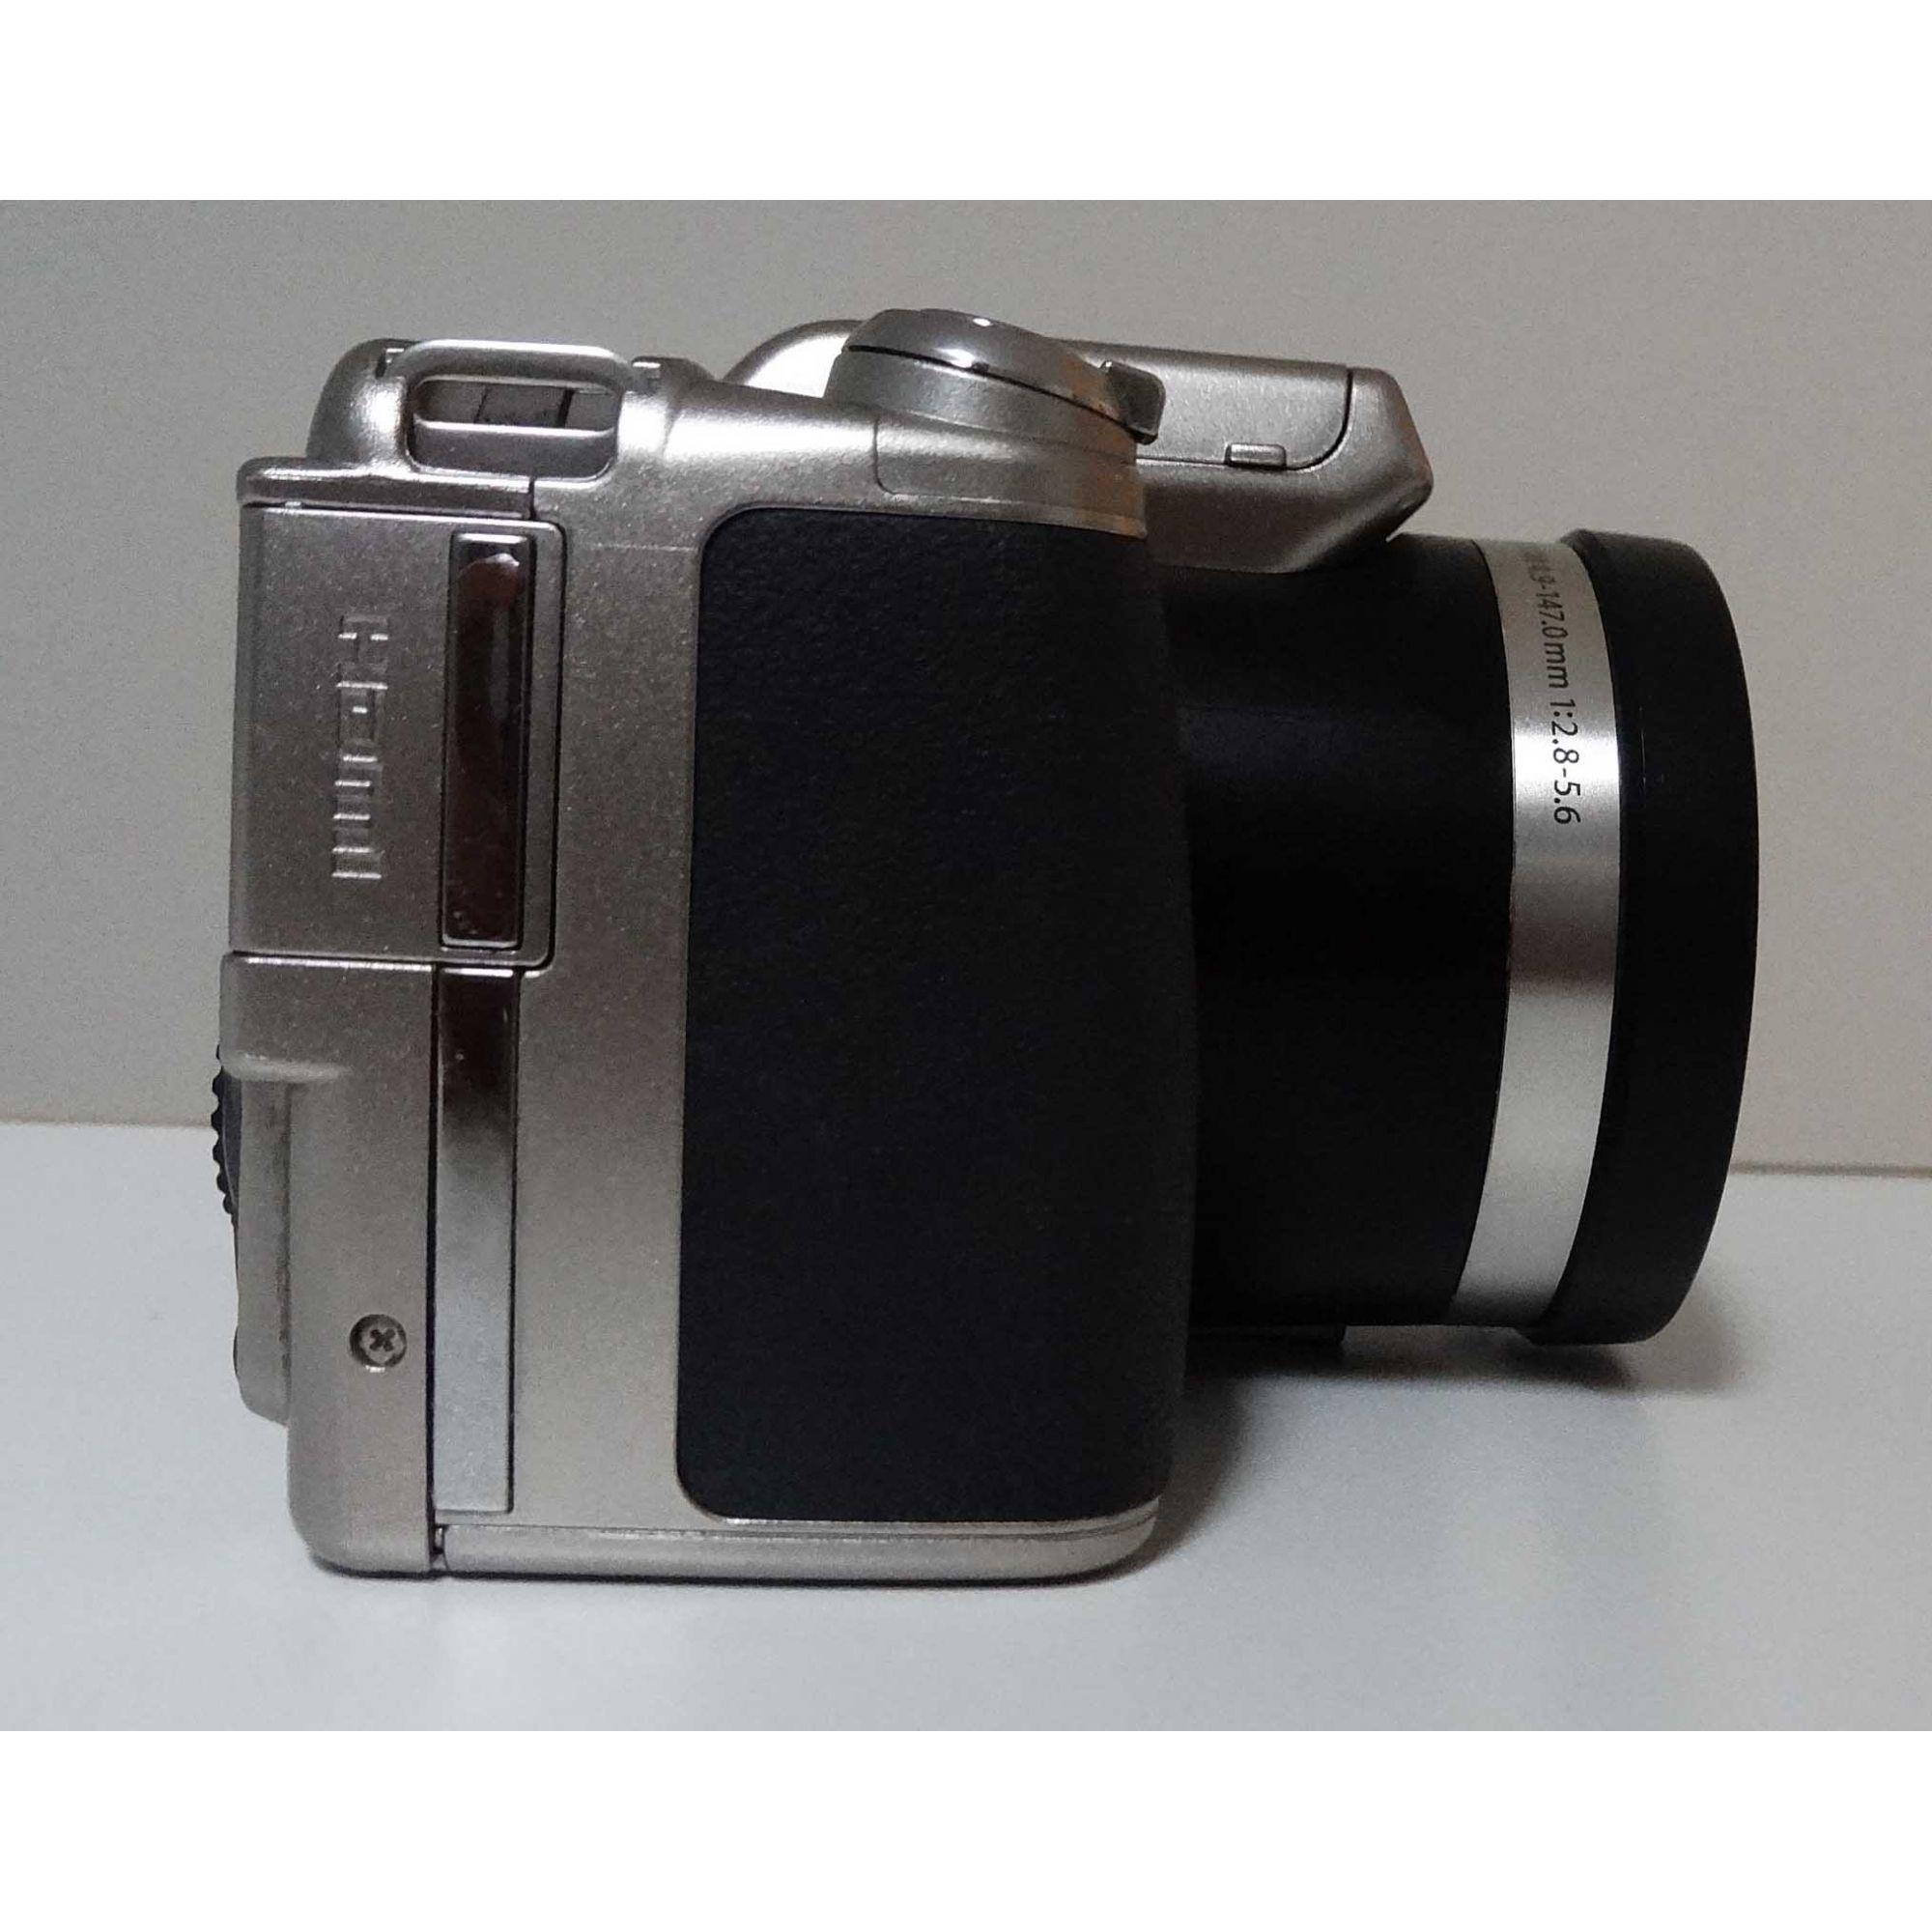 Câmera Digital Olympus SP-800UZ 14 Megapixel + cartão SD 4GB